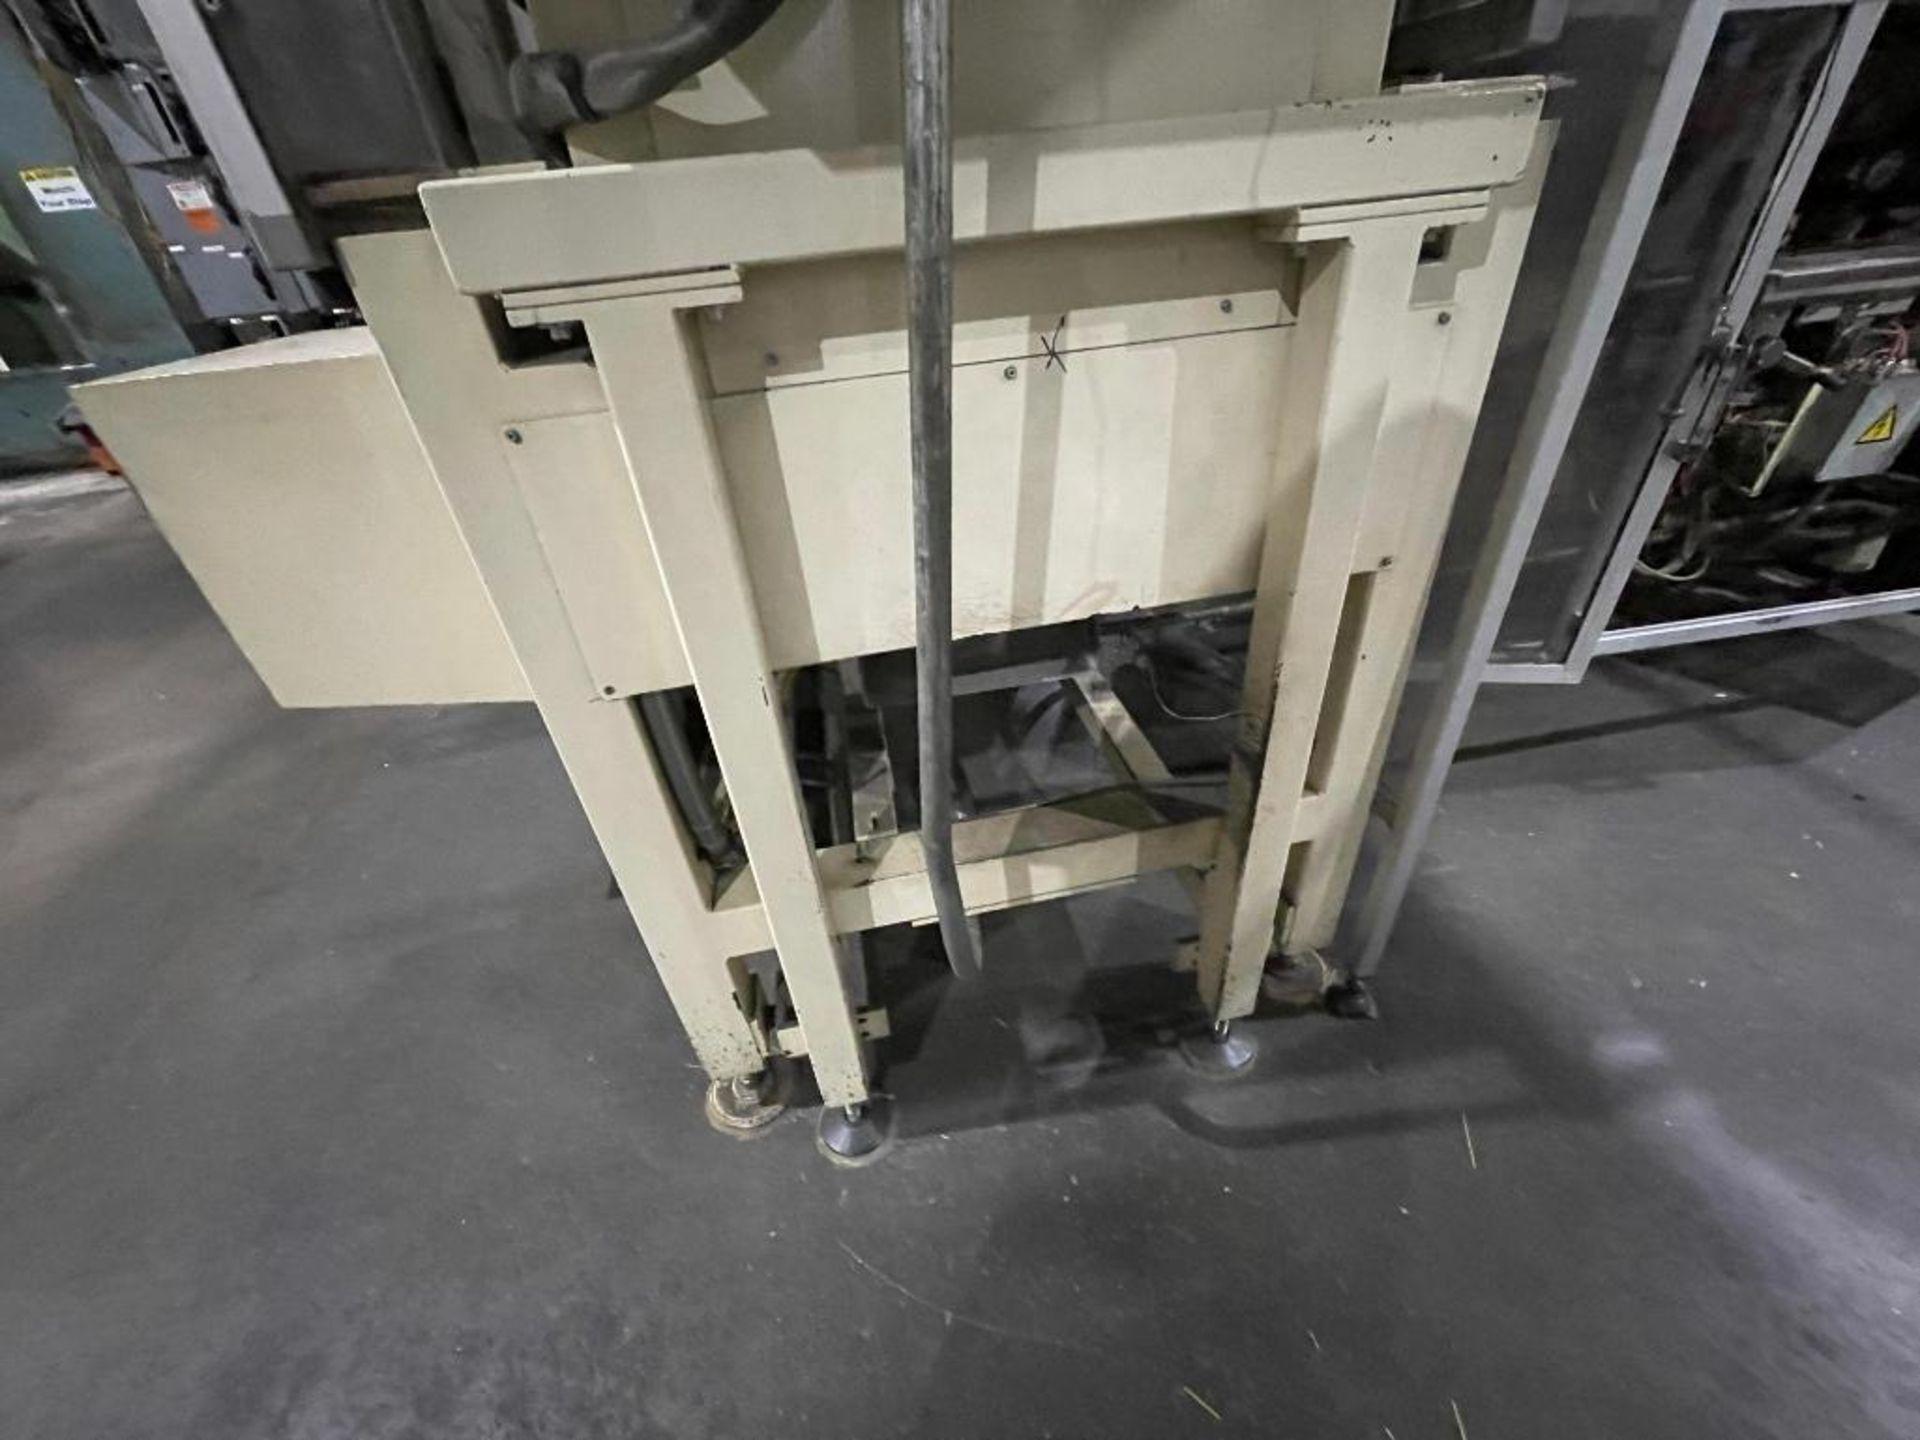 Stiavelli long goods horizontal flow wrapper - Image 30 of 53